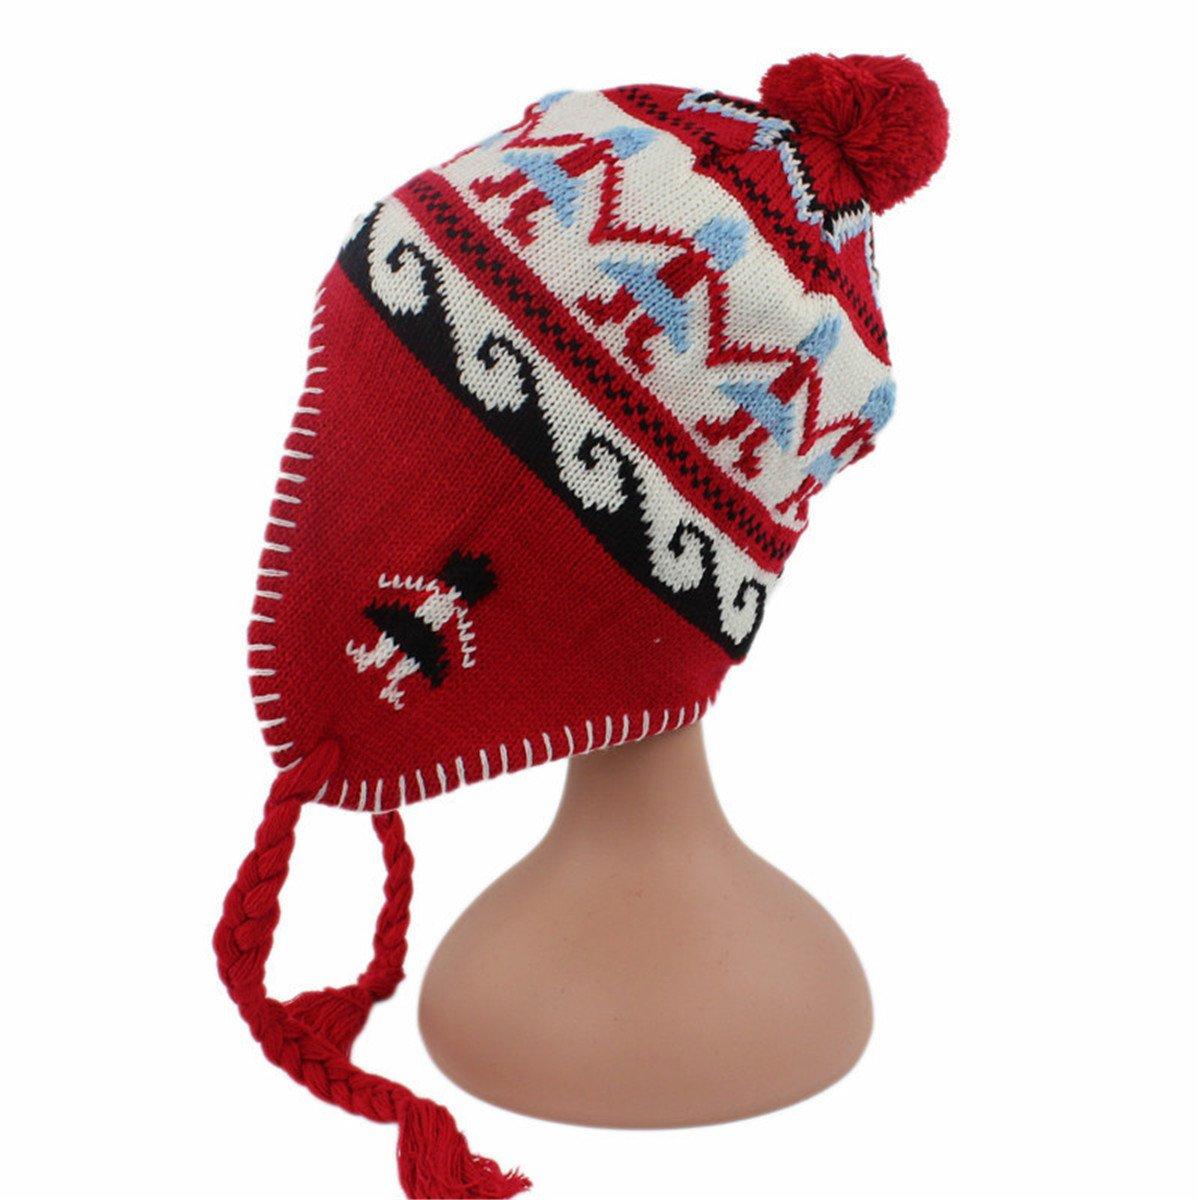 Qhome Kids Children Knit Hat Christmas Gift Warm Earmuffs Cap